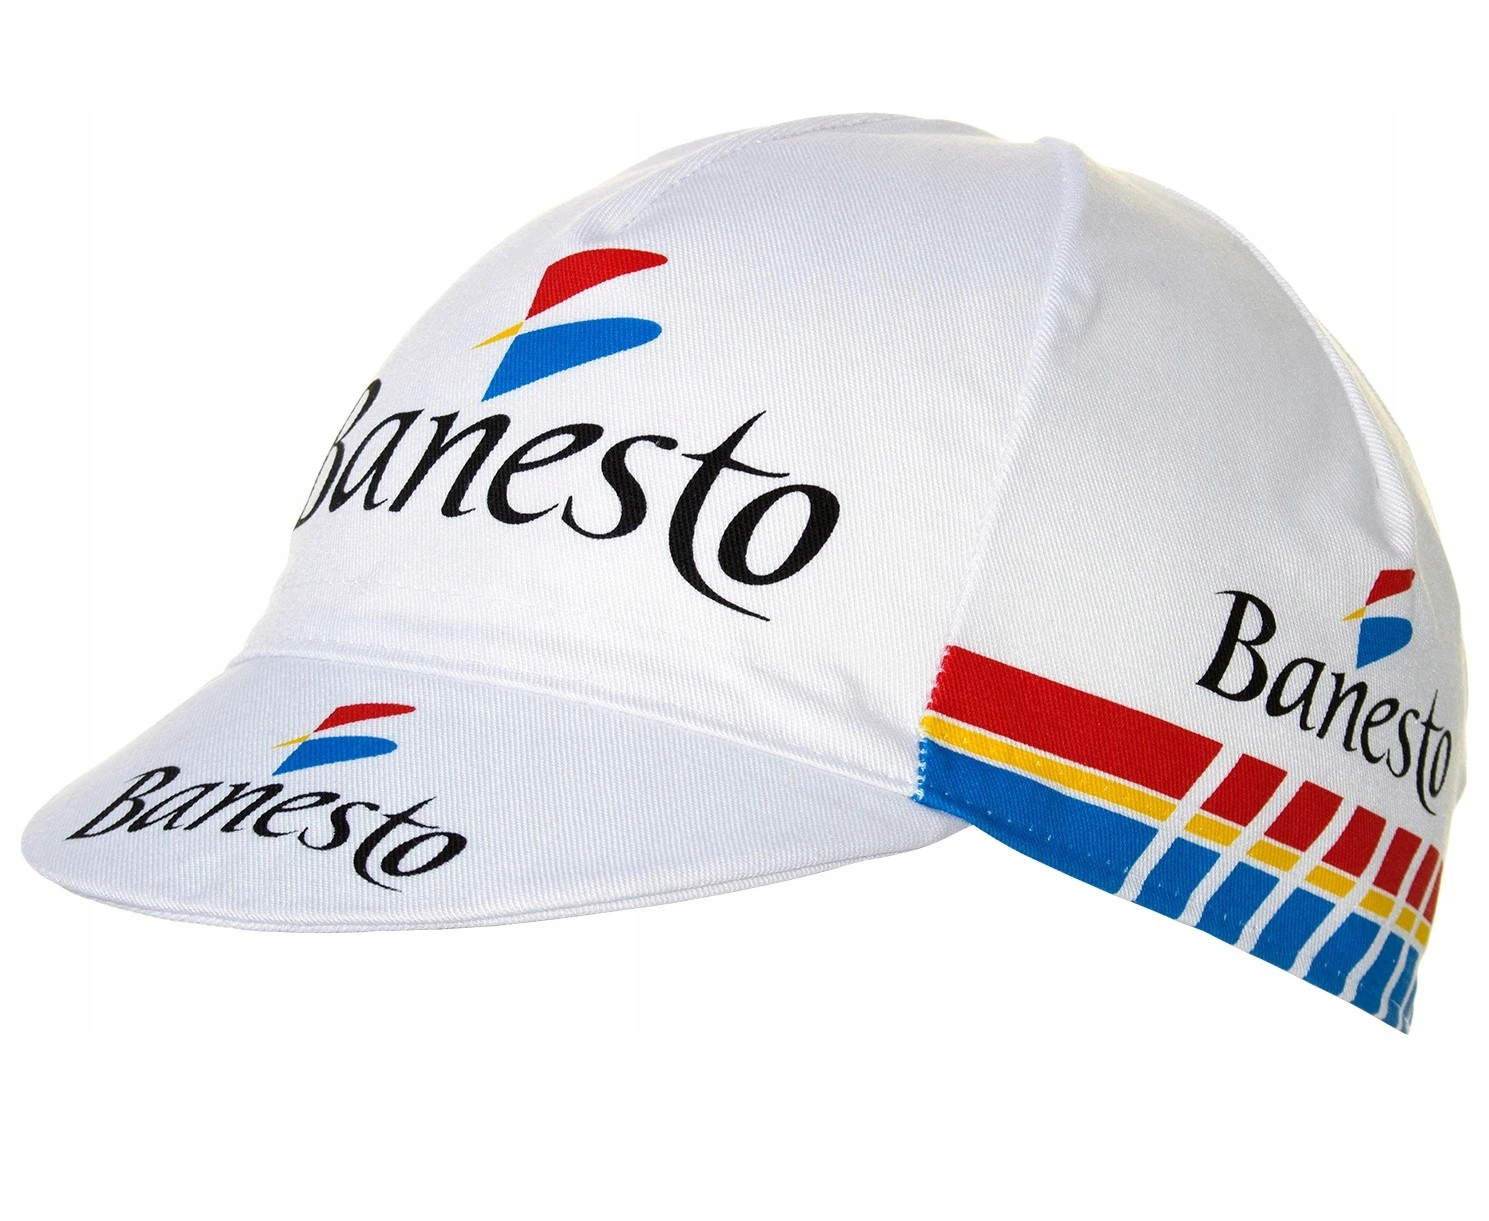 Retro cyklistická čiapka Banesto - APIS